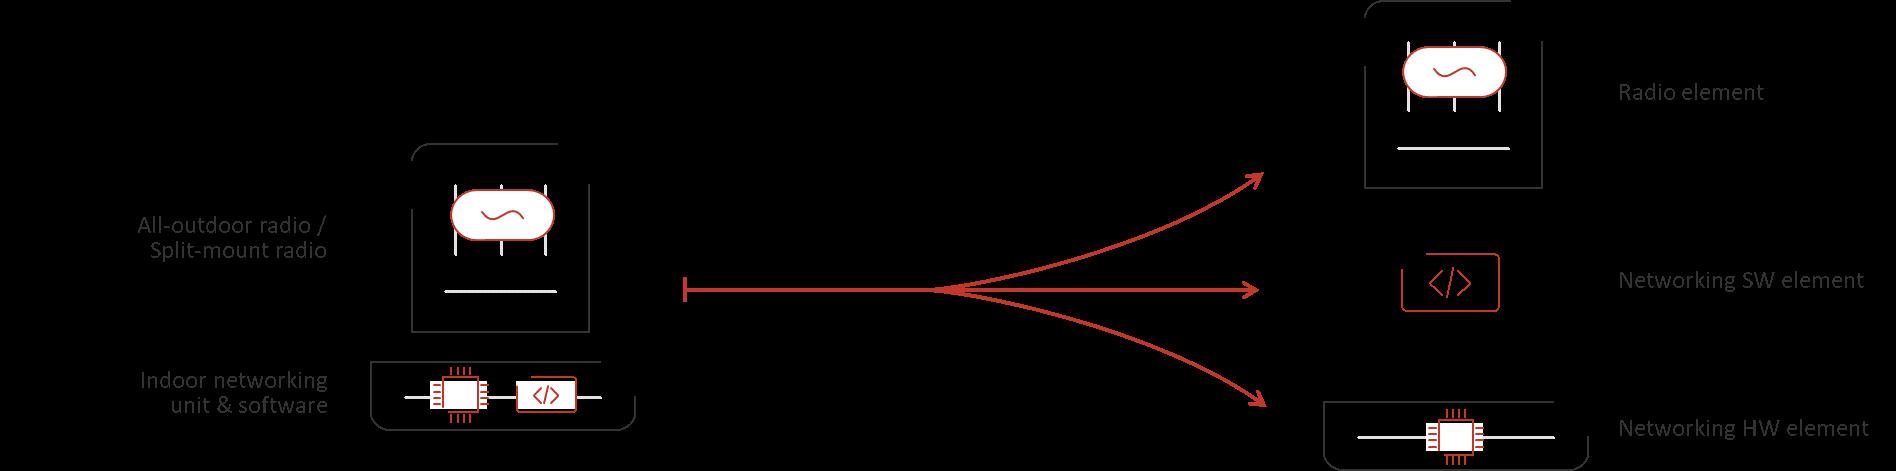 Disaggregated wireless backhaul